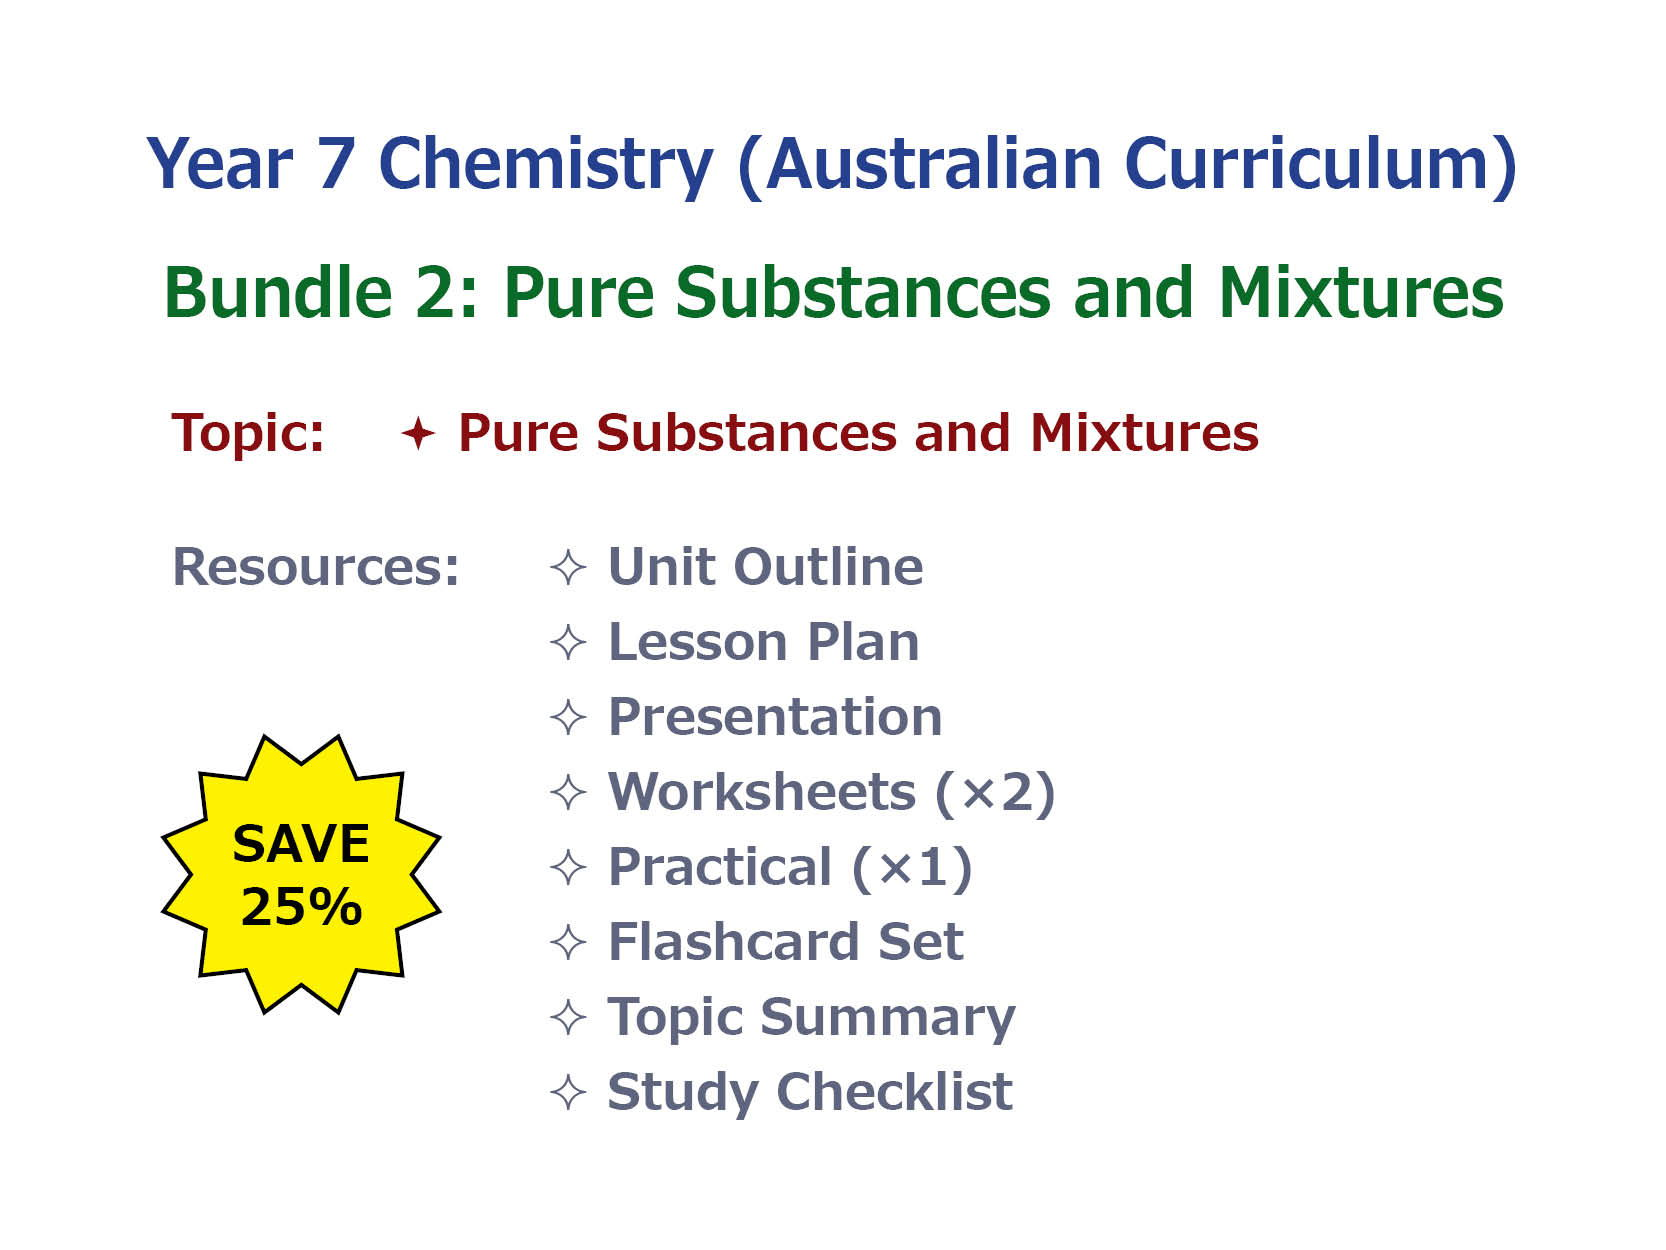 worksheet Mixture Worksheet 7au chemistry pure substance and mixtures bundle by goodscienceworksheets teaching resources tes